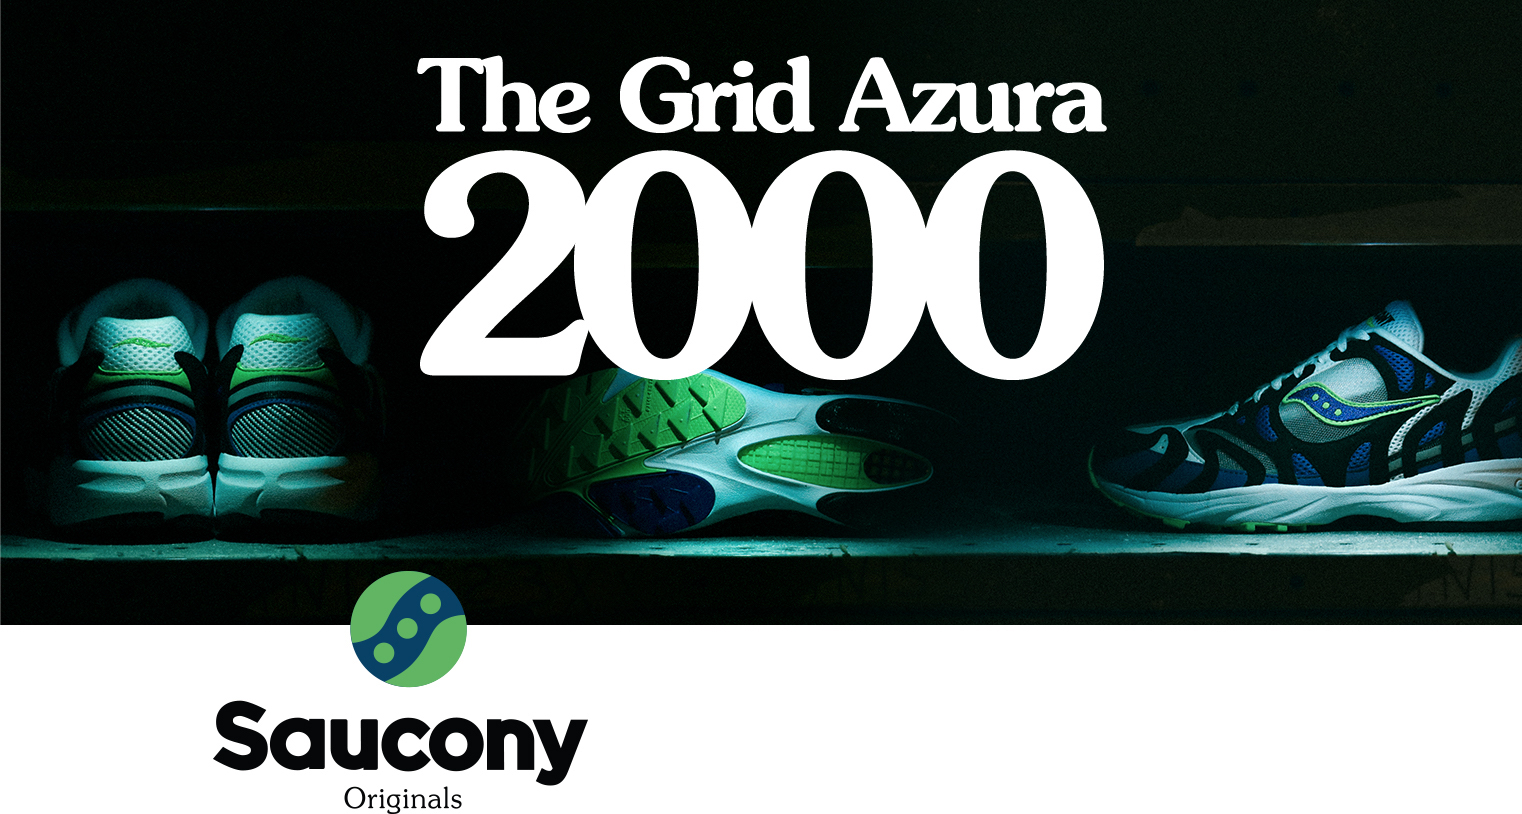 The Grid Azura 2000